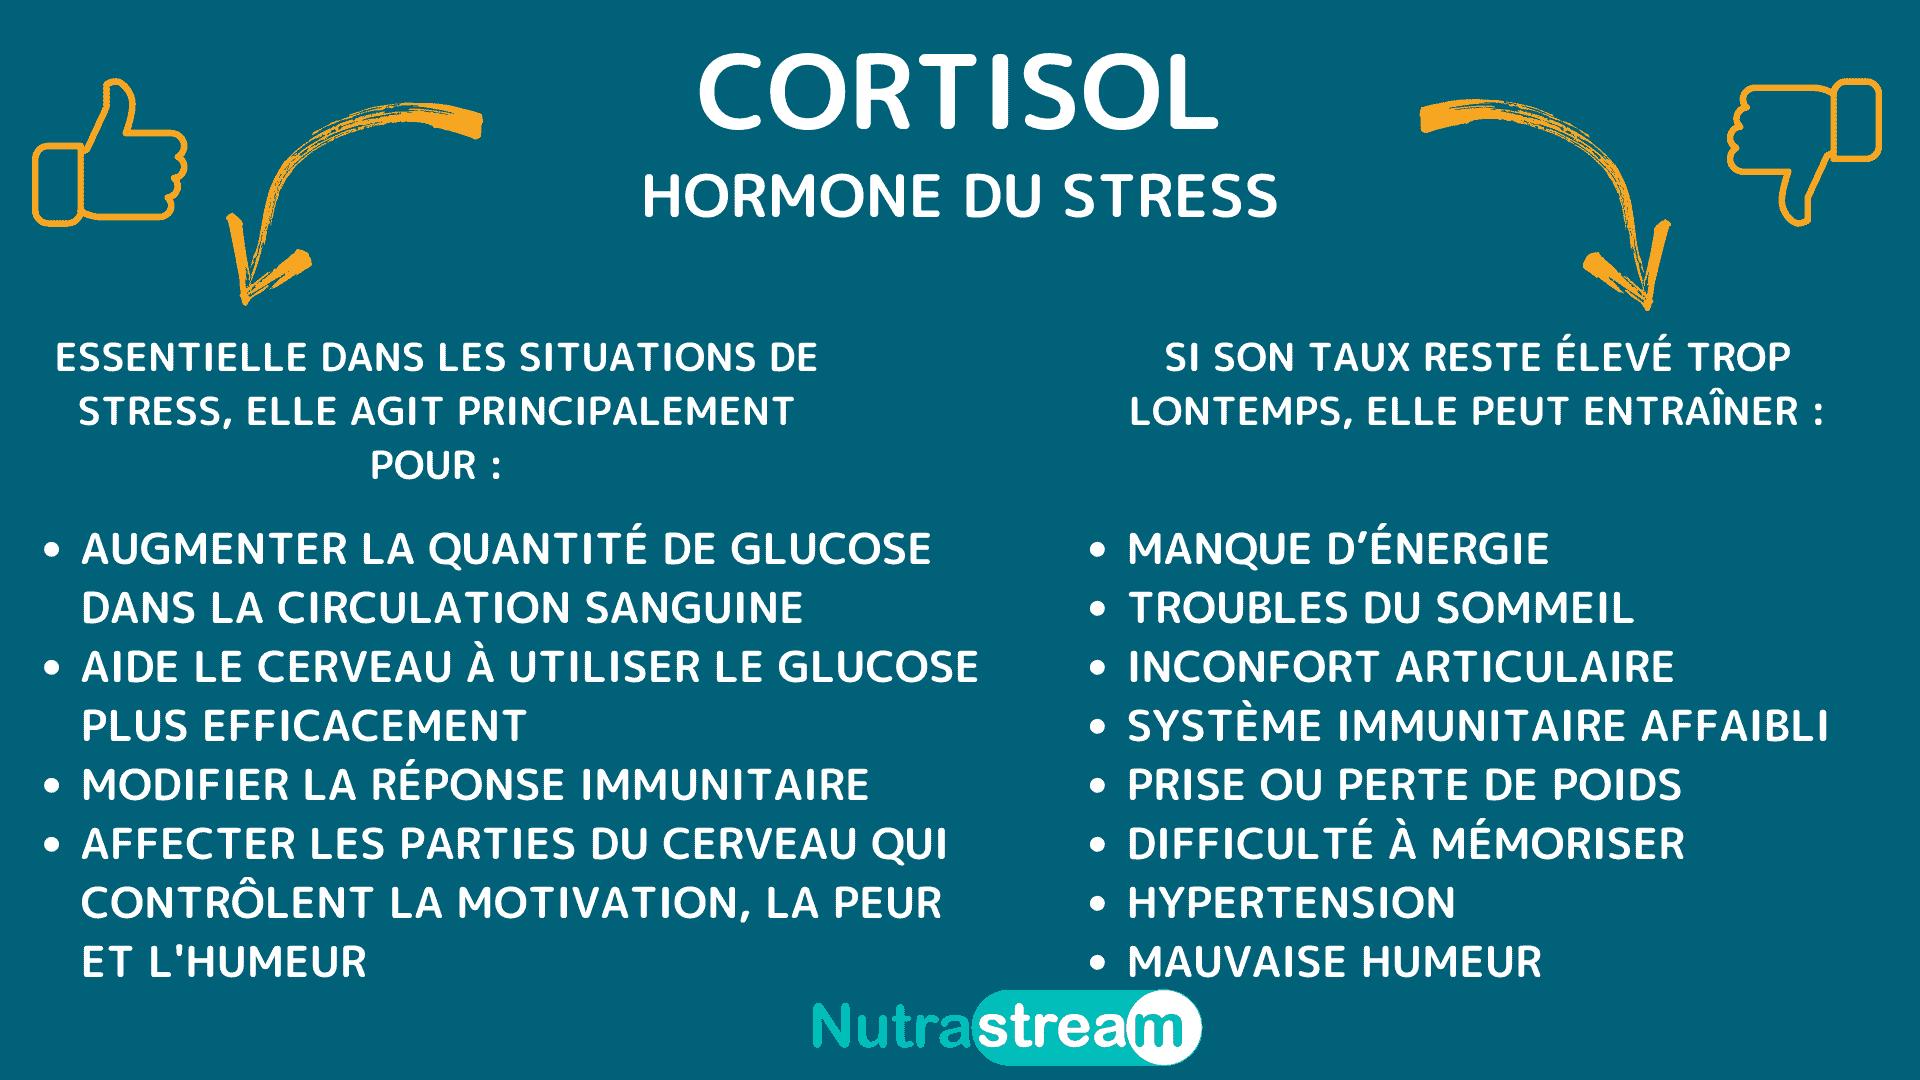 Cortisol, hormone du stress Nutrastream